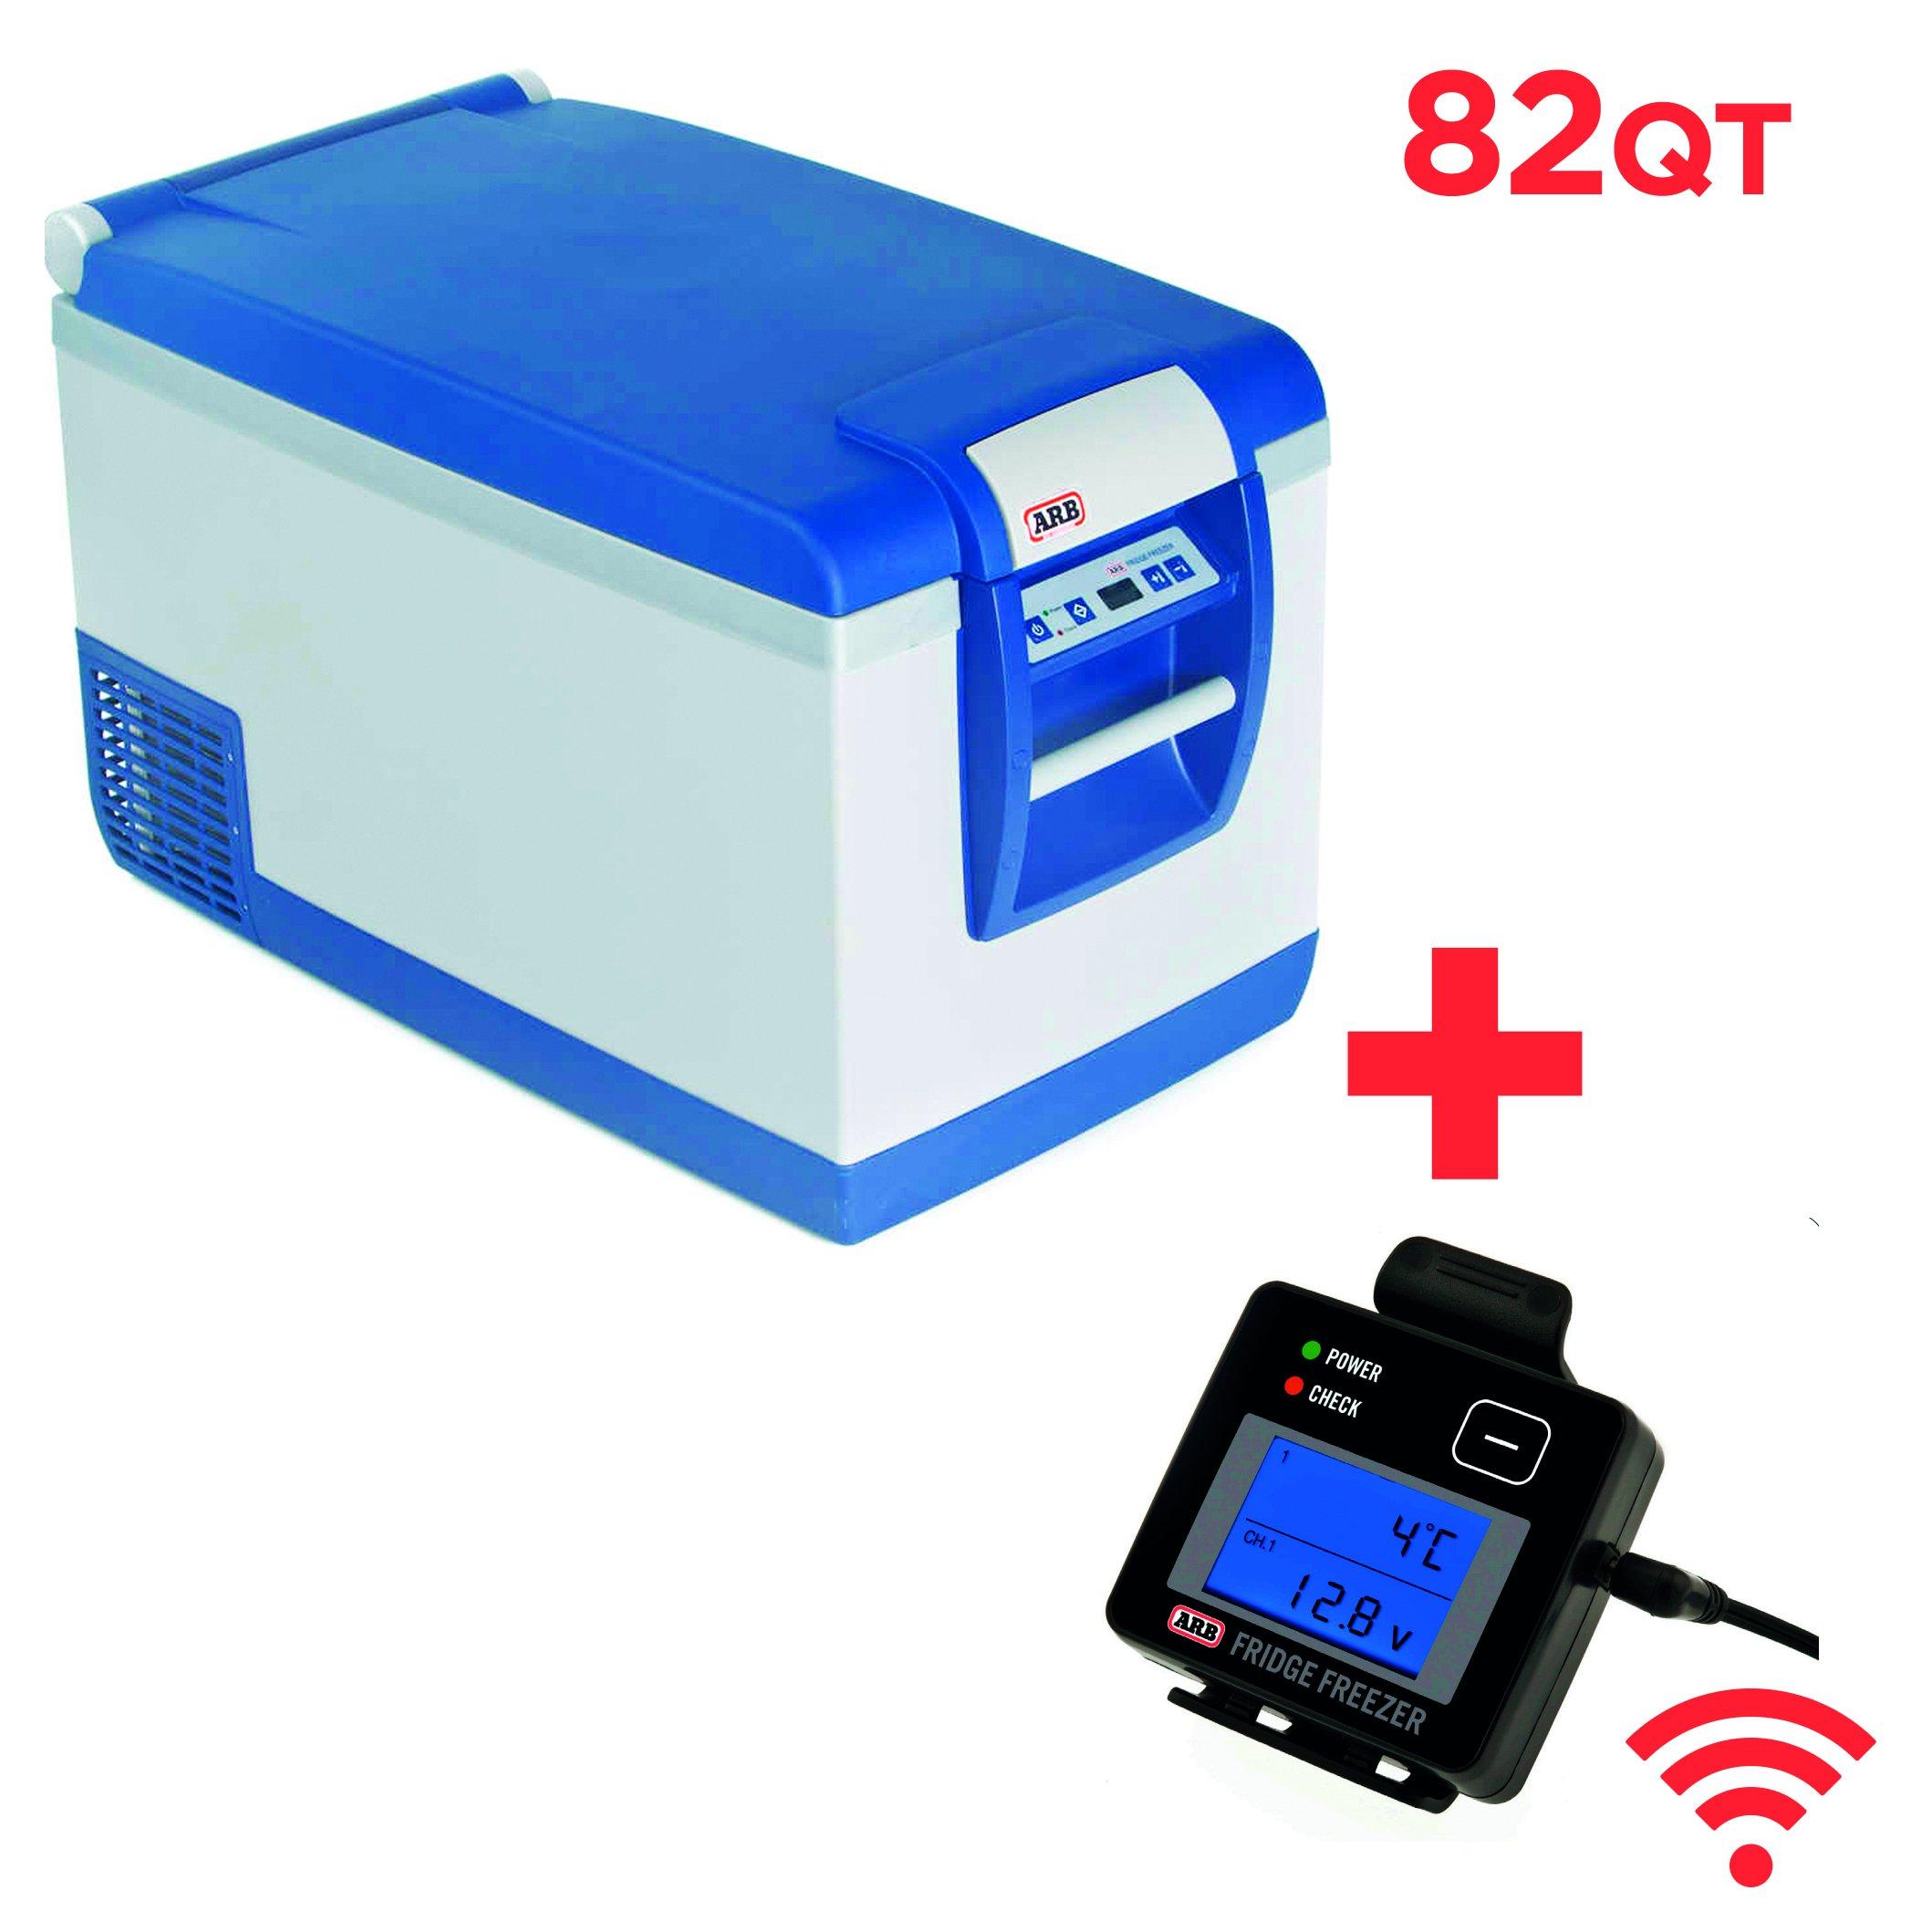 ARB Fridge Freezer 82 Quart Bundle with ARB Wireless Fridge Remote Display 10800782RM by ARB (Image #1)